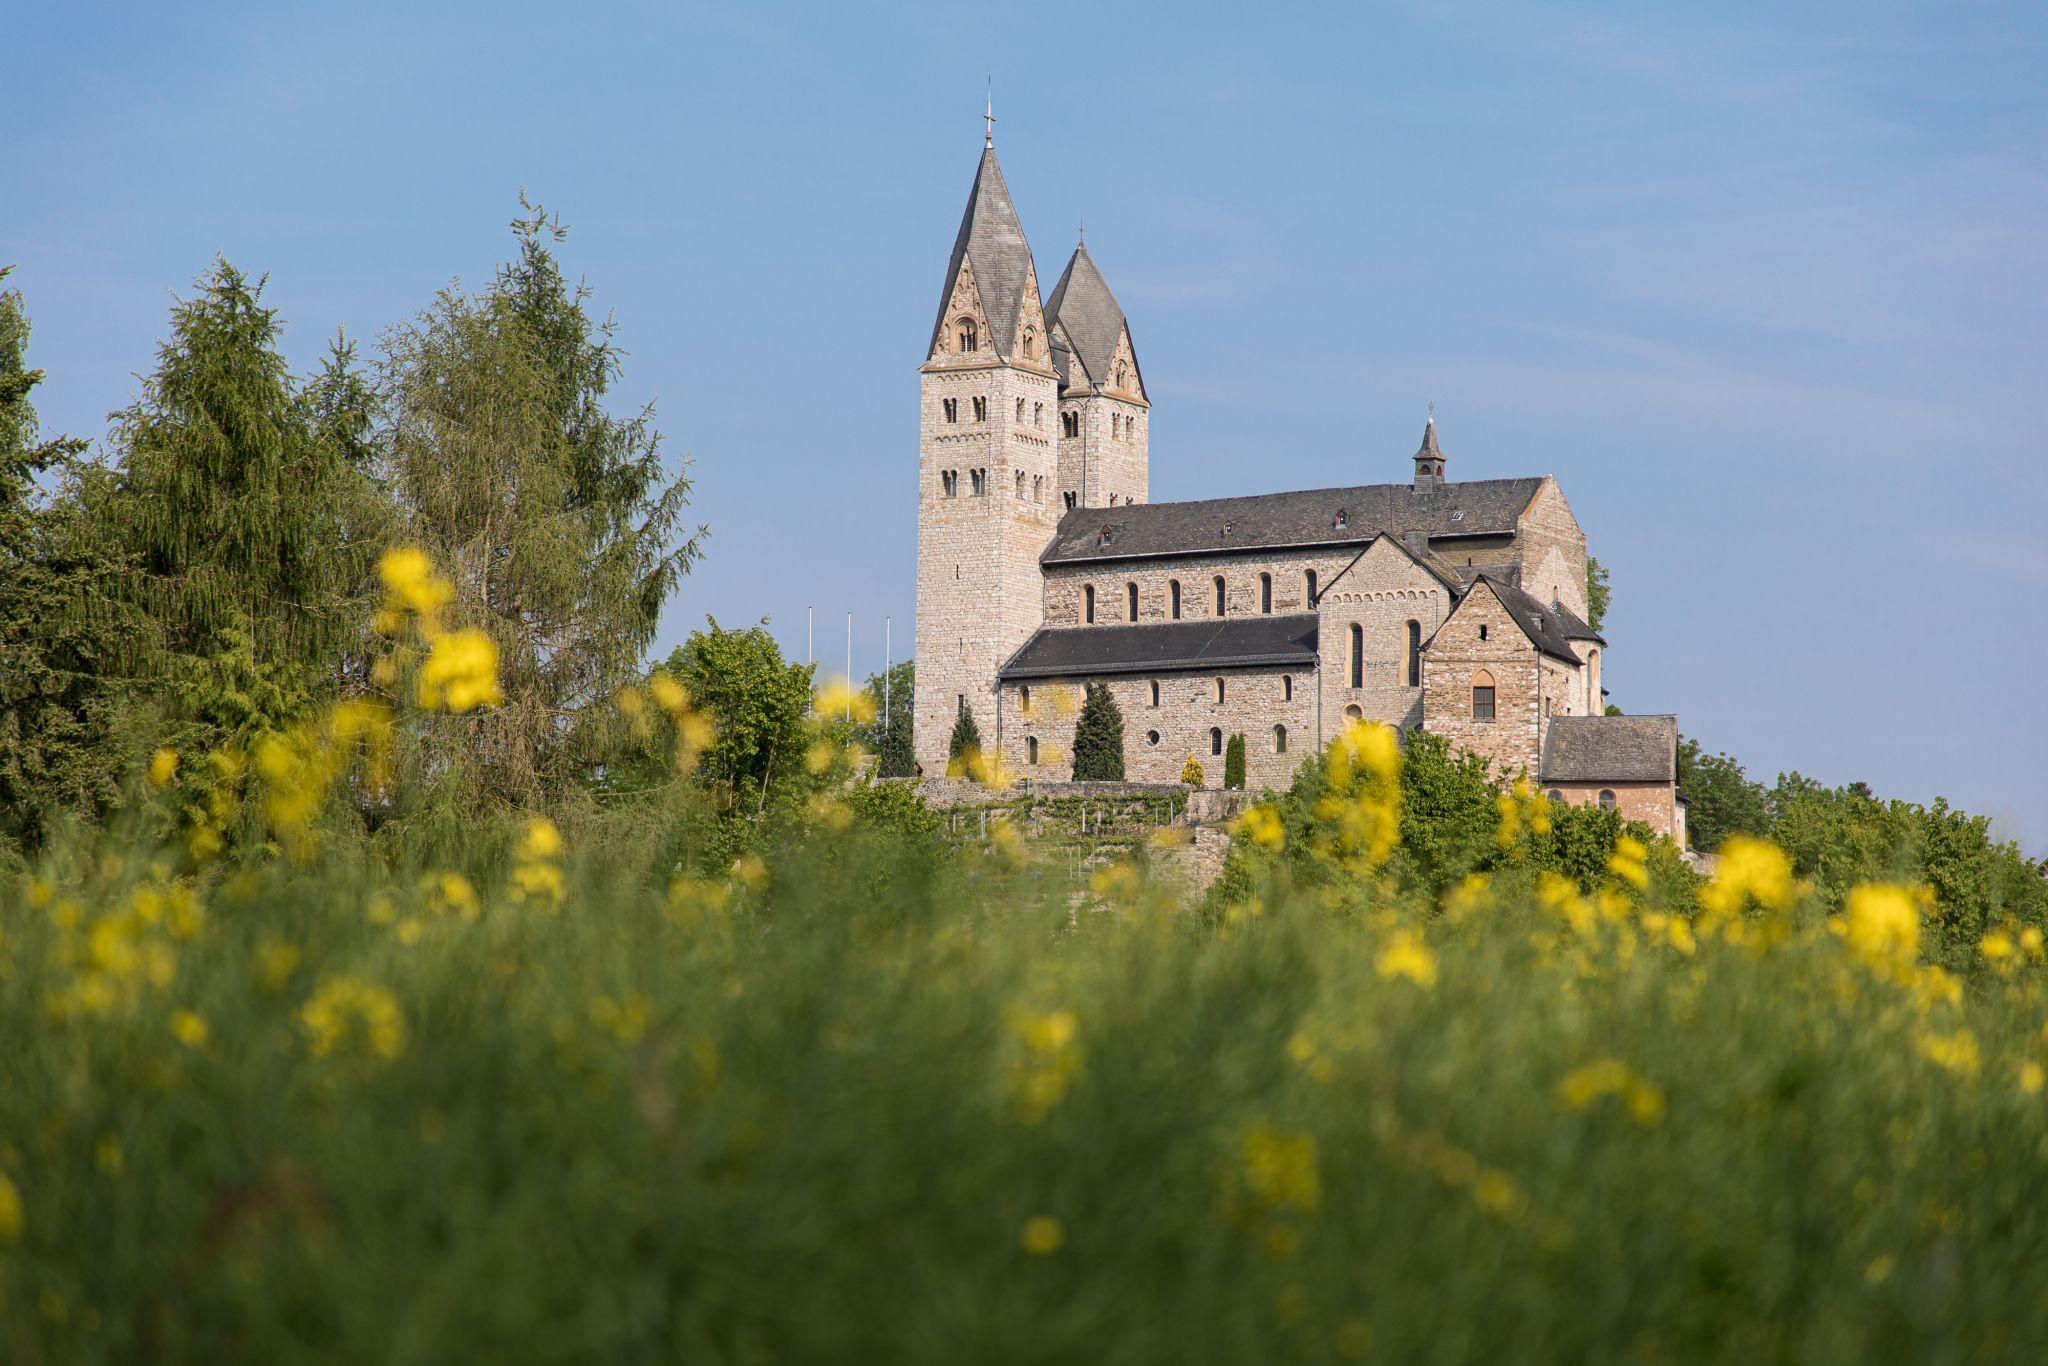 Lubentiuskirche, Germany